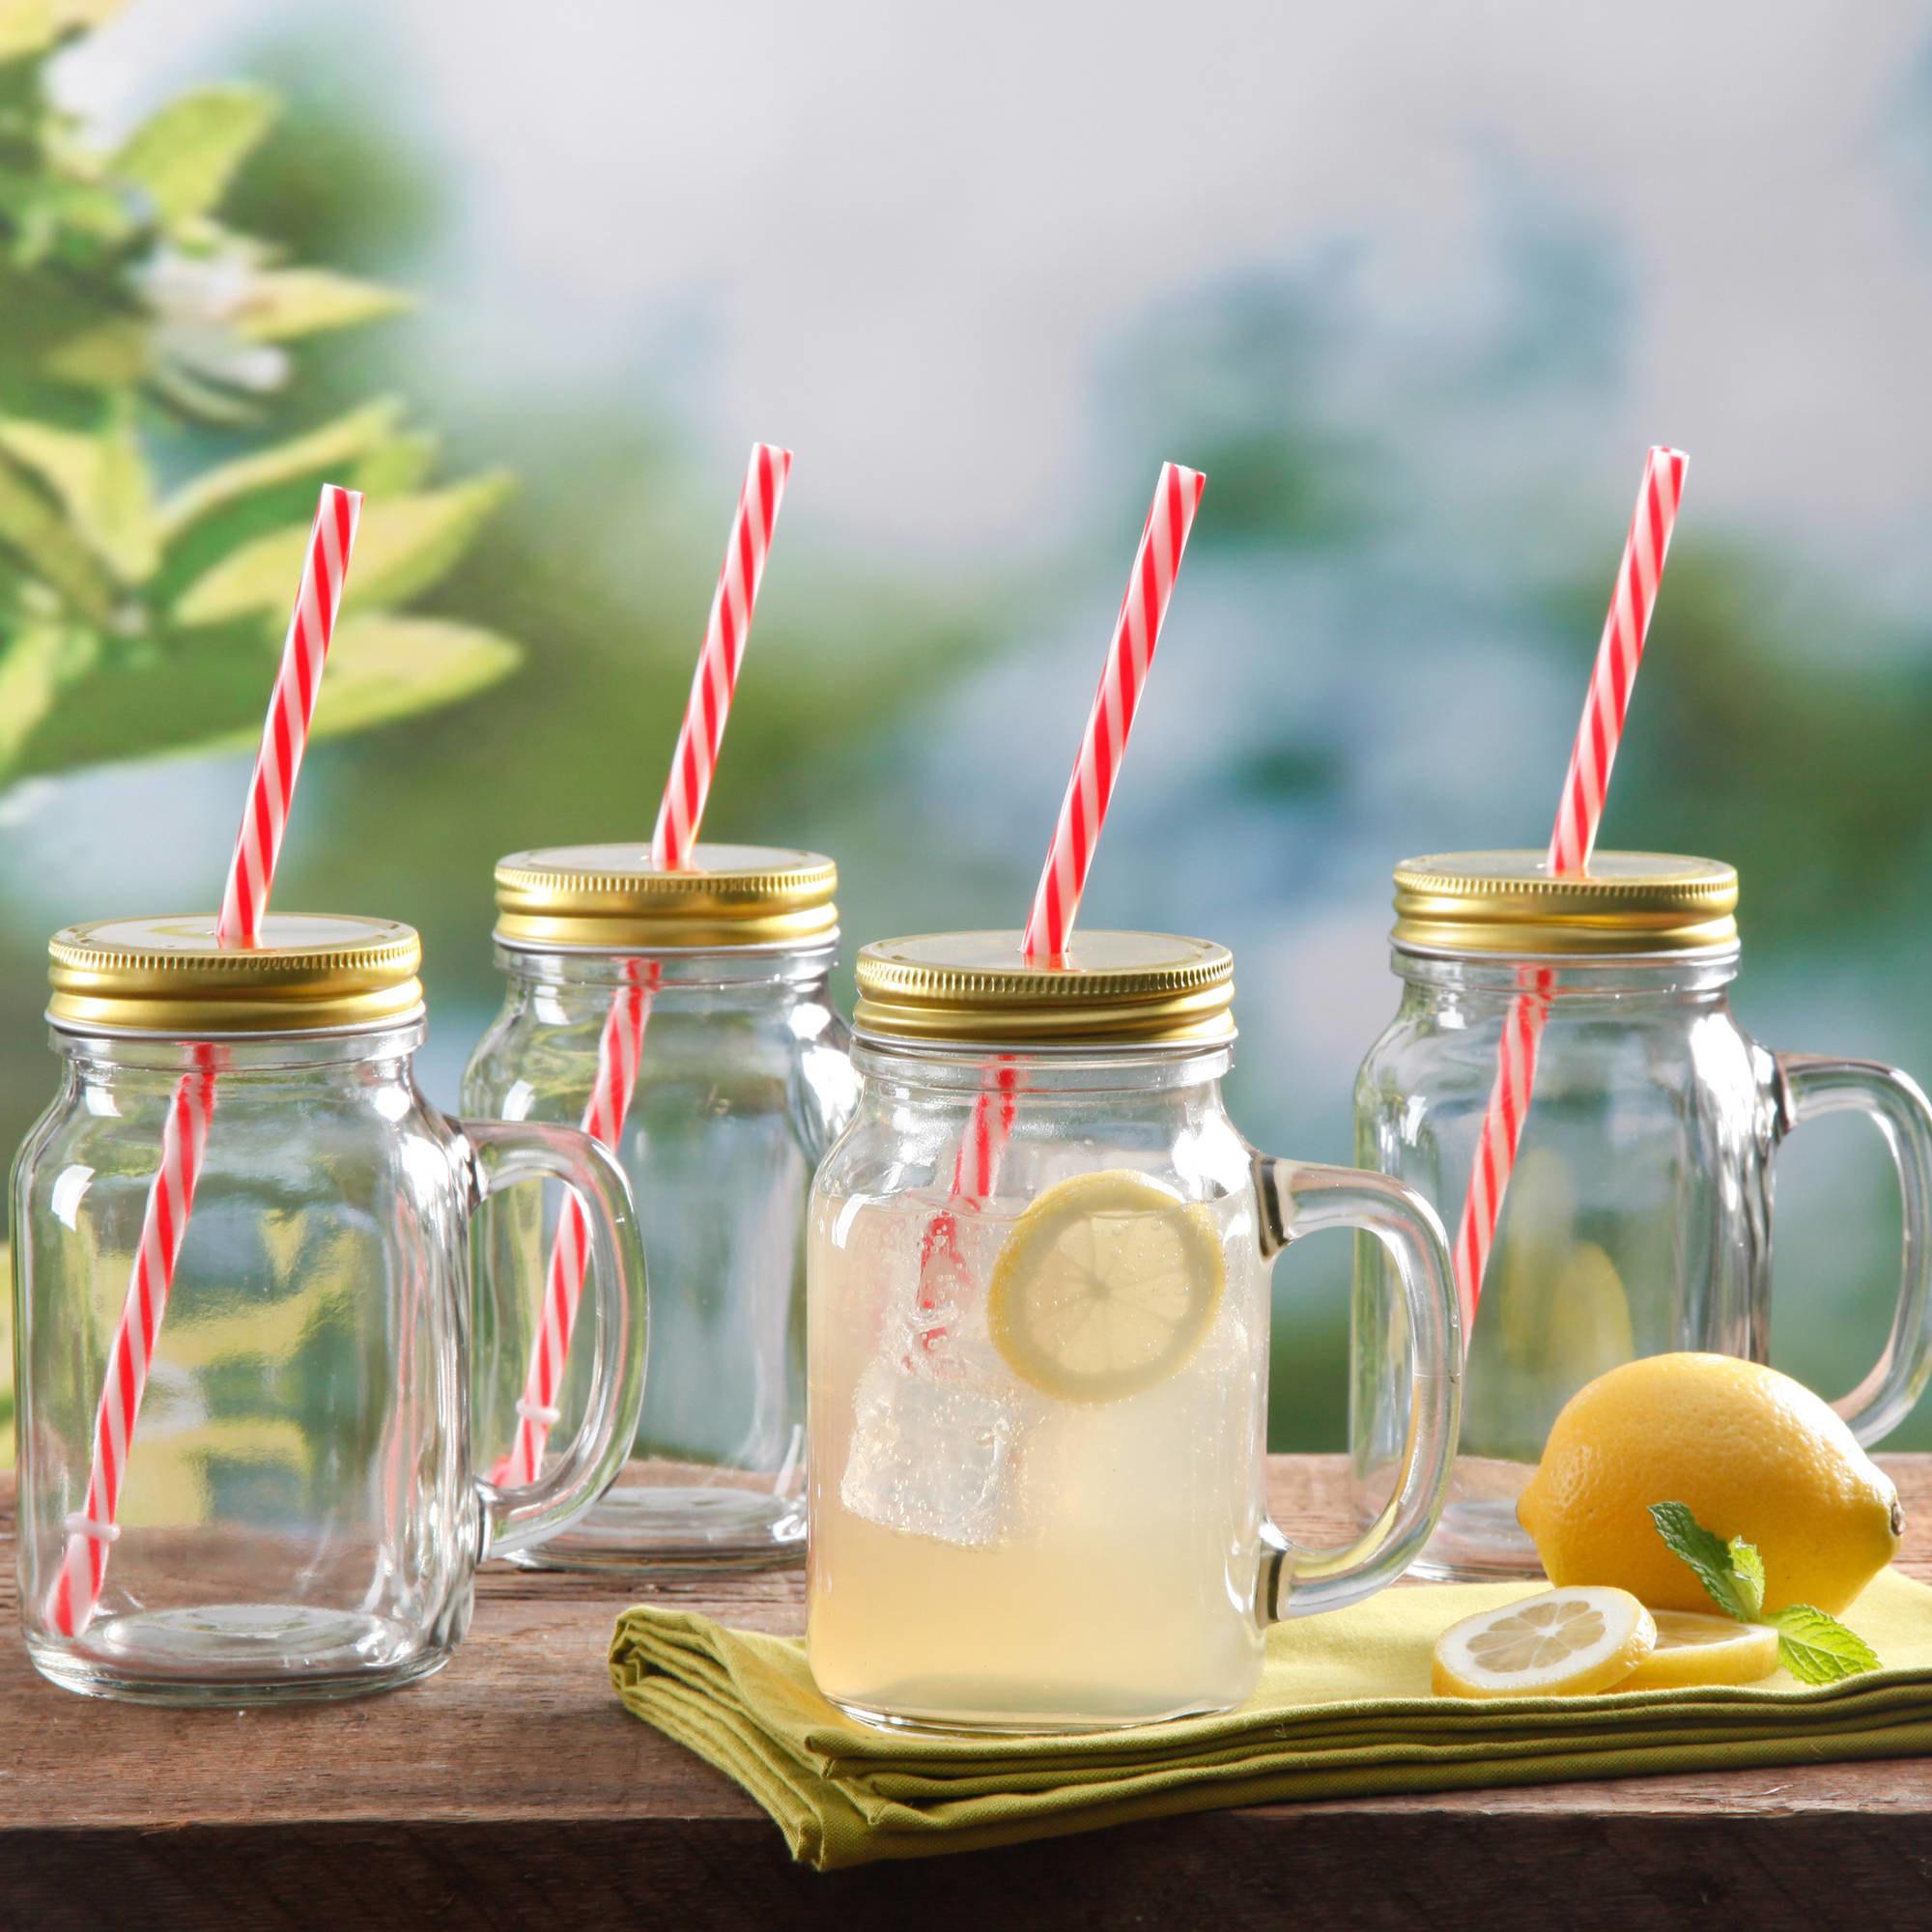 mason jar mugs with lemonade and red straws